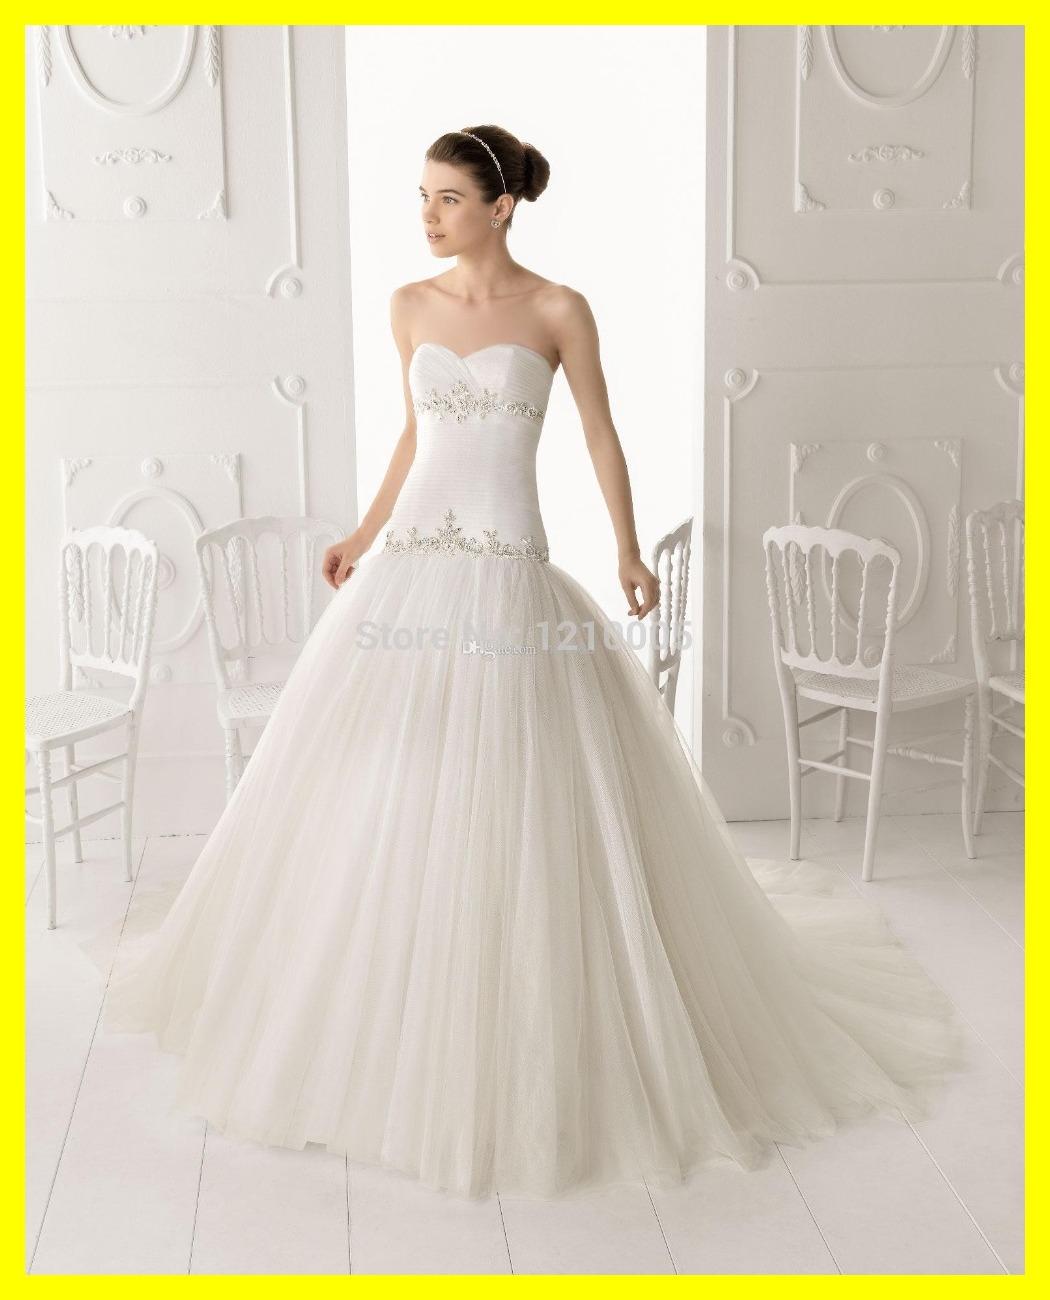 Summer wedding dress satin dresses with long trains beach for Summer wedding beach dresses